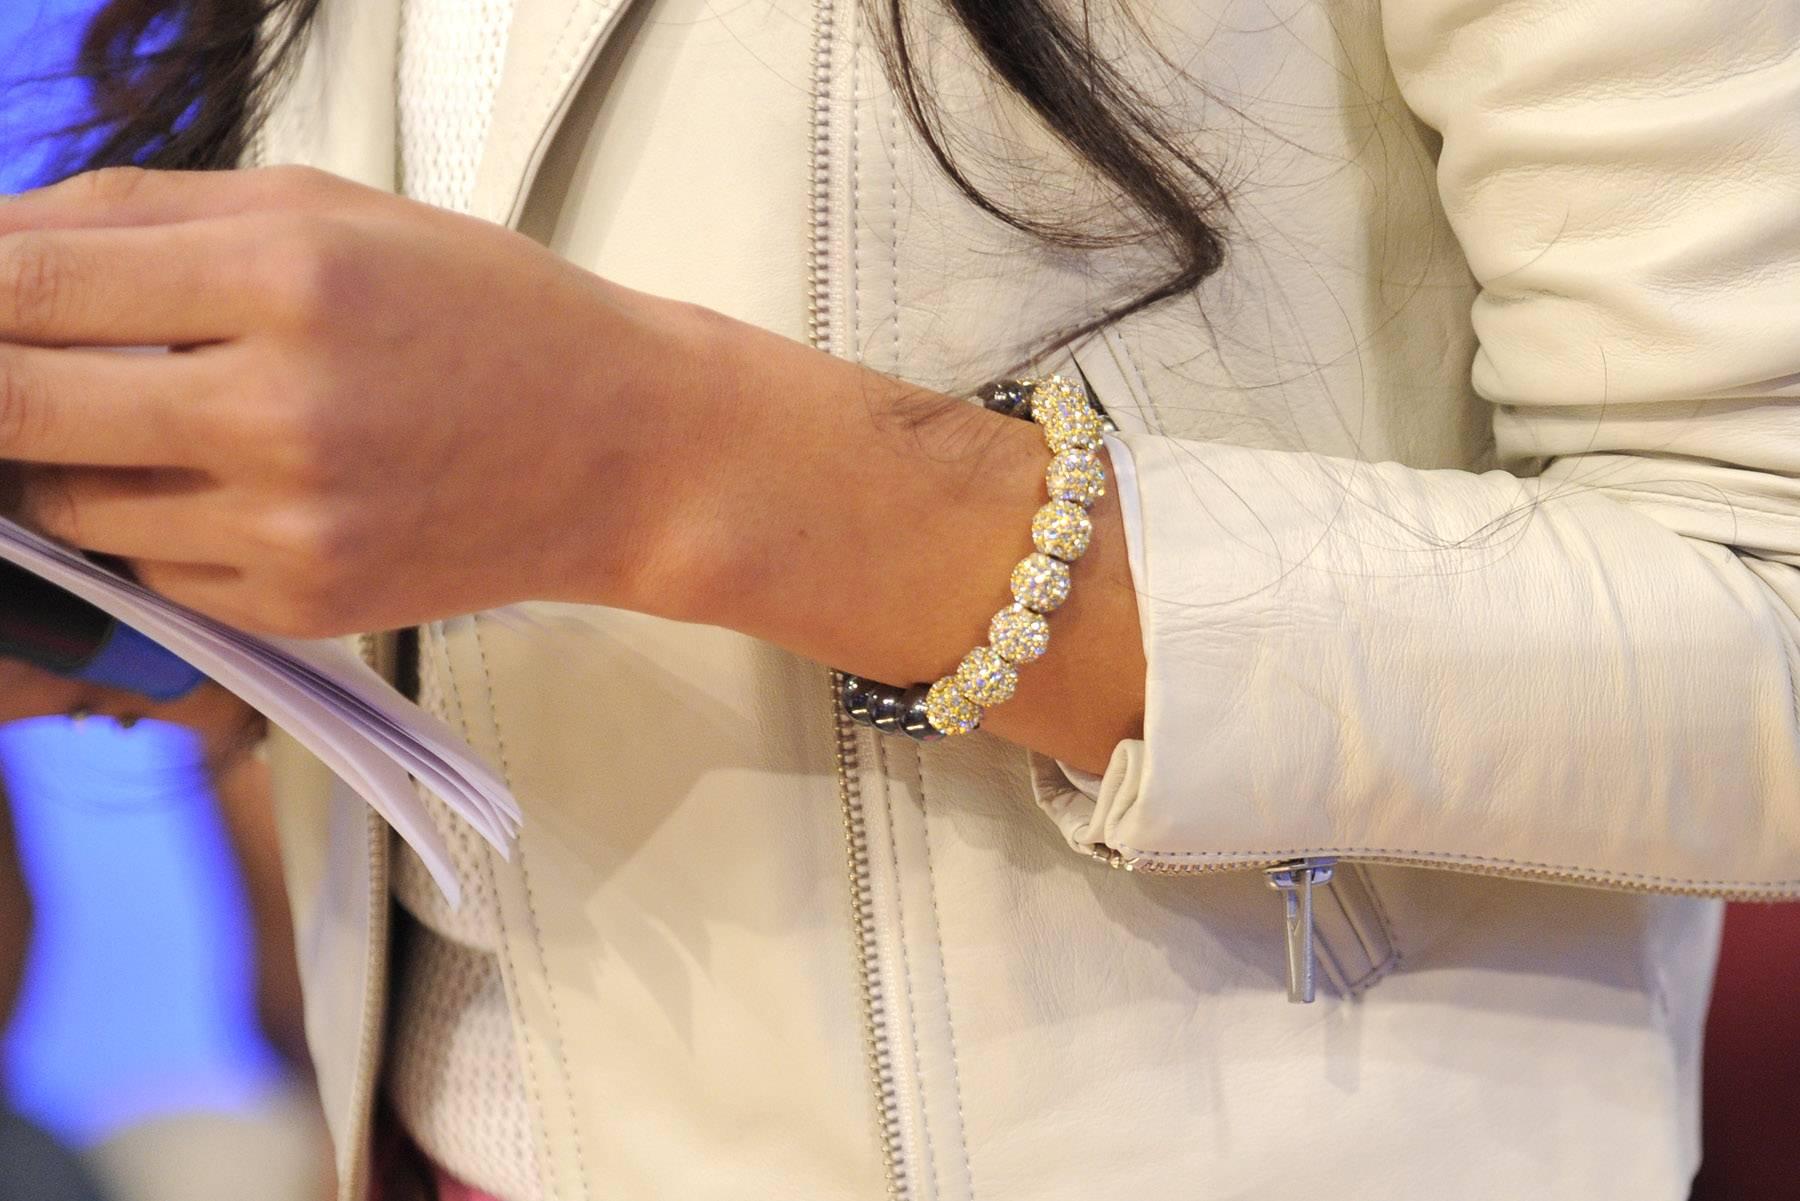 Rocsi's bracelet. - Rocsi Diaz at 106 & Park, May 16, 2012. (Photo: John Ricard / BET)